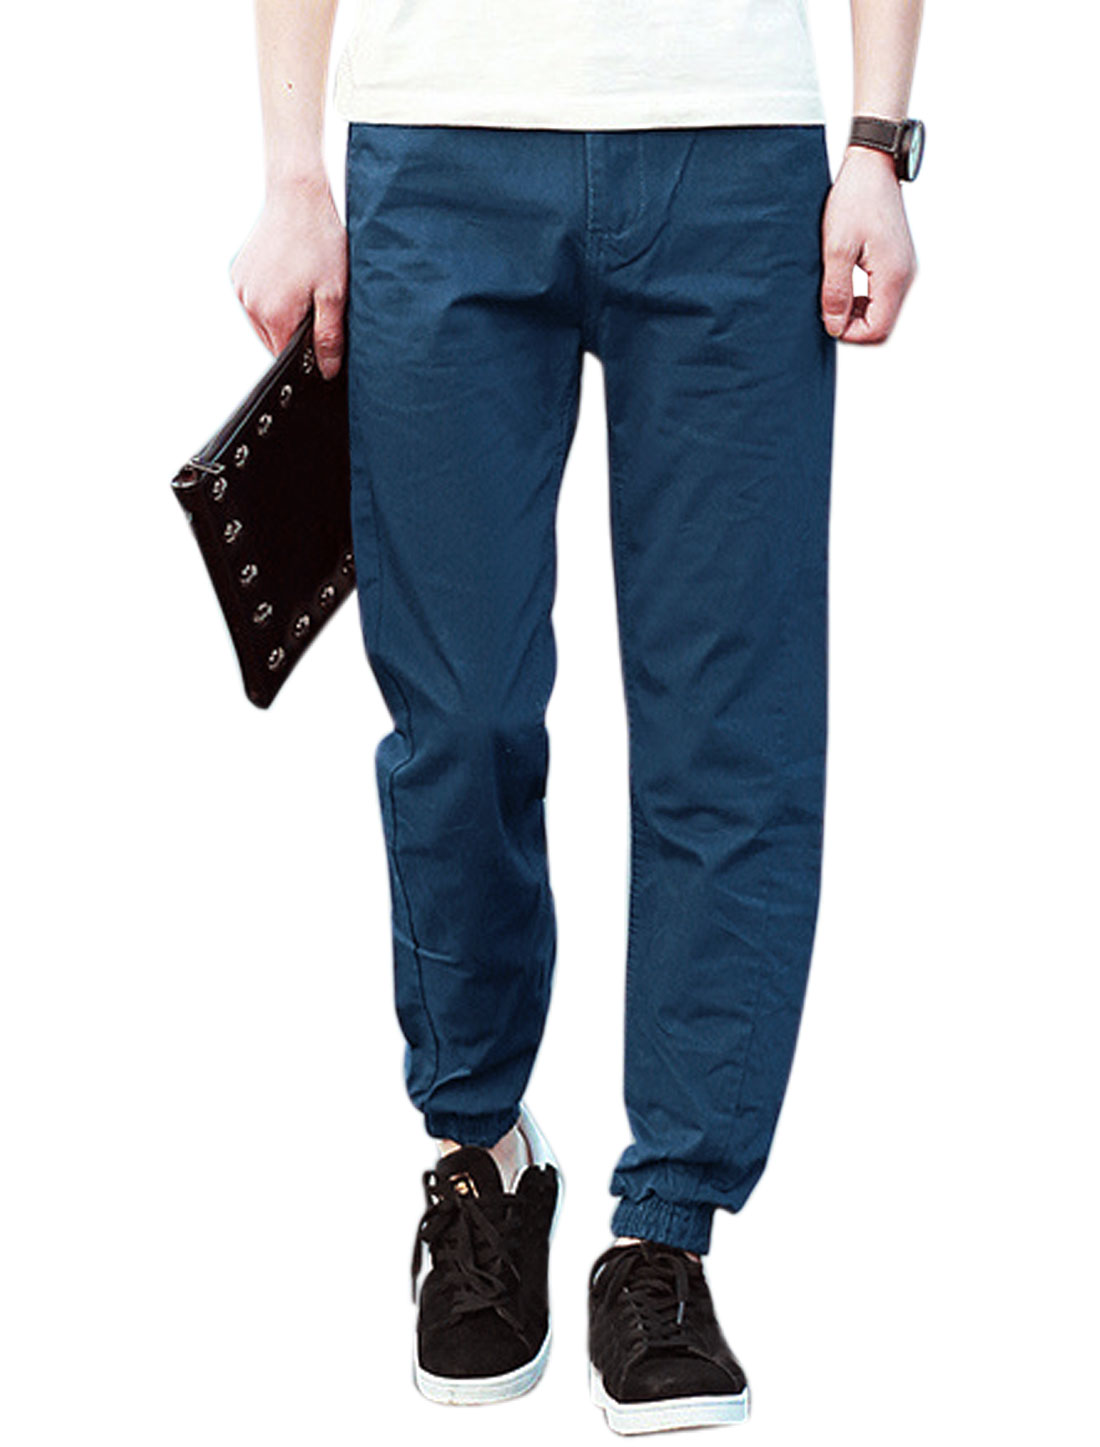 Men Elastic Cuffs Mock Flap Pockets Back Leisure Pants Dark Blues W32